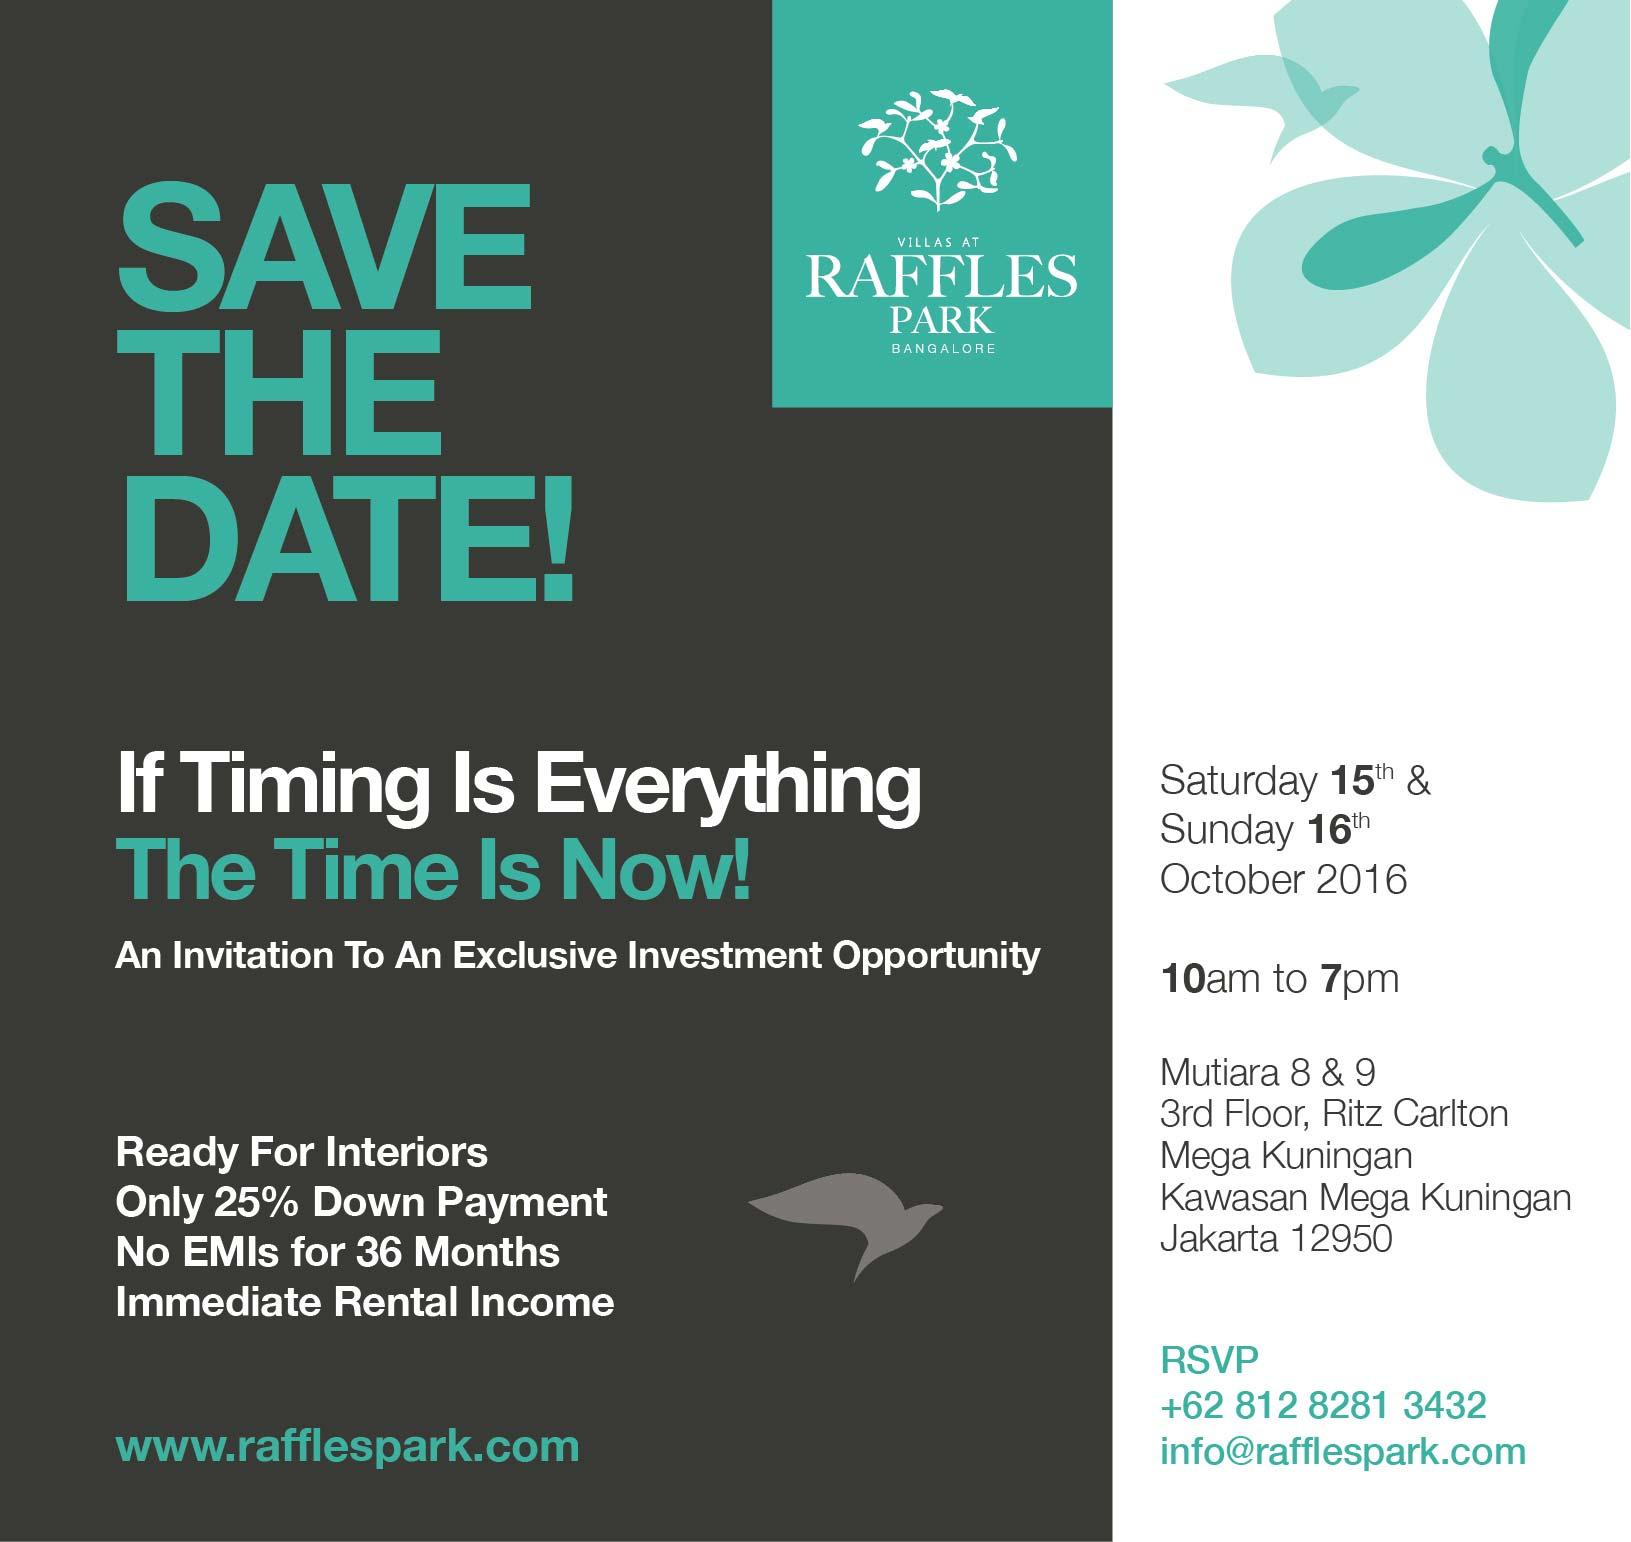 Raffle Park Bangalore - Save the Date JAKARTA